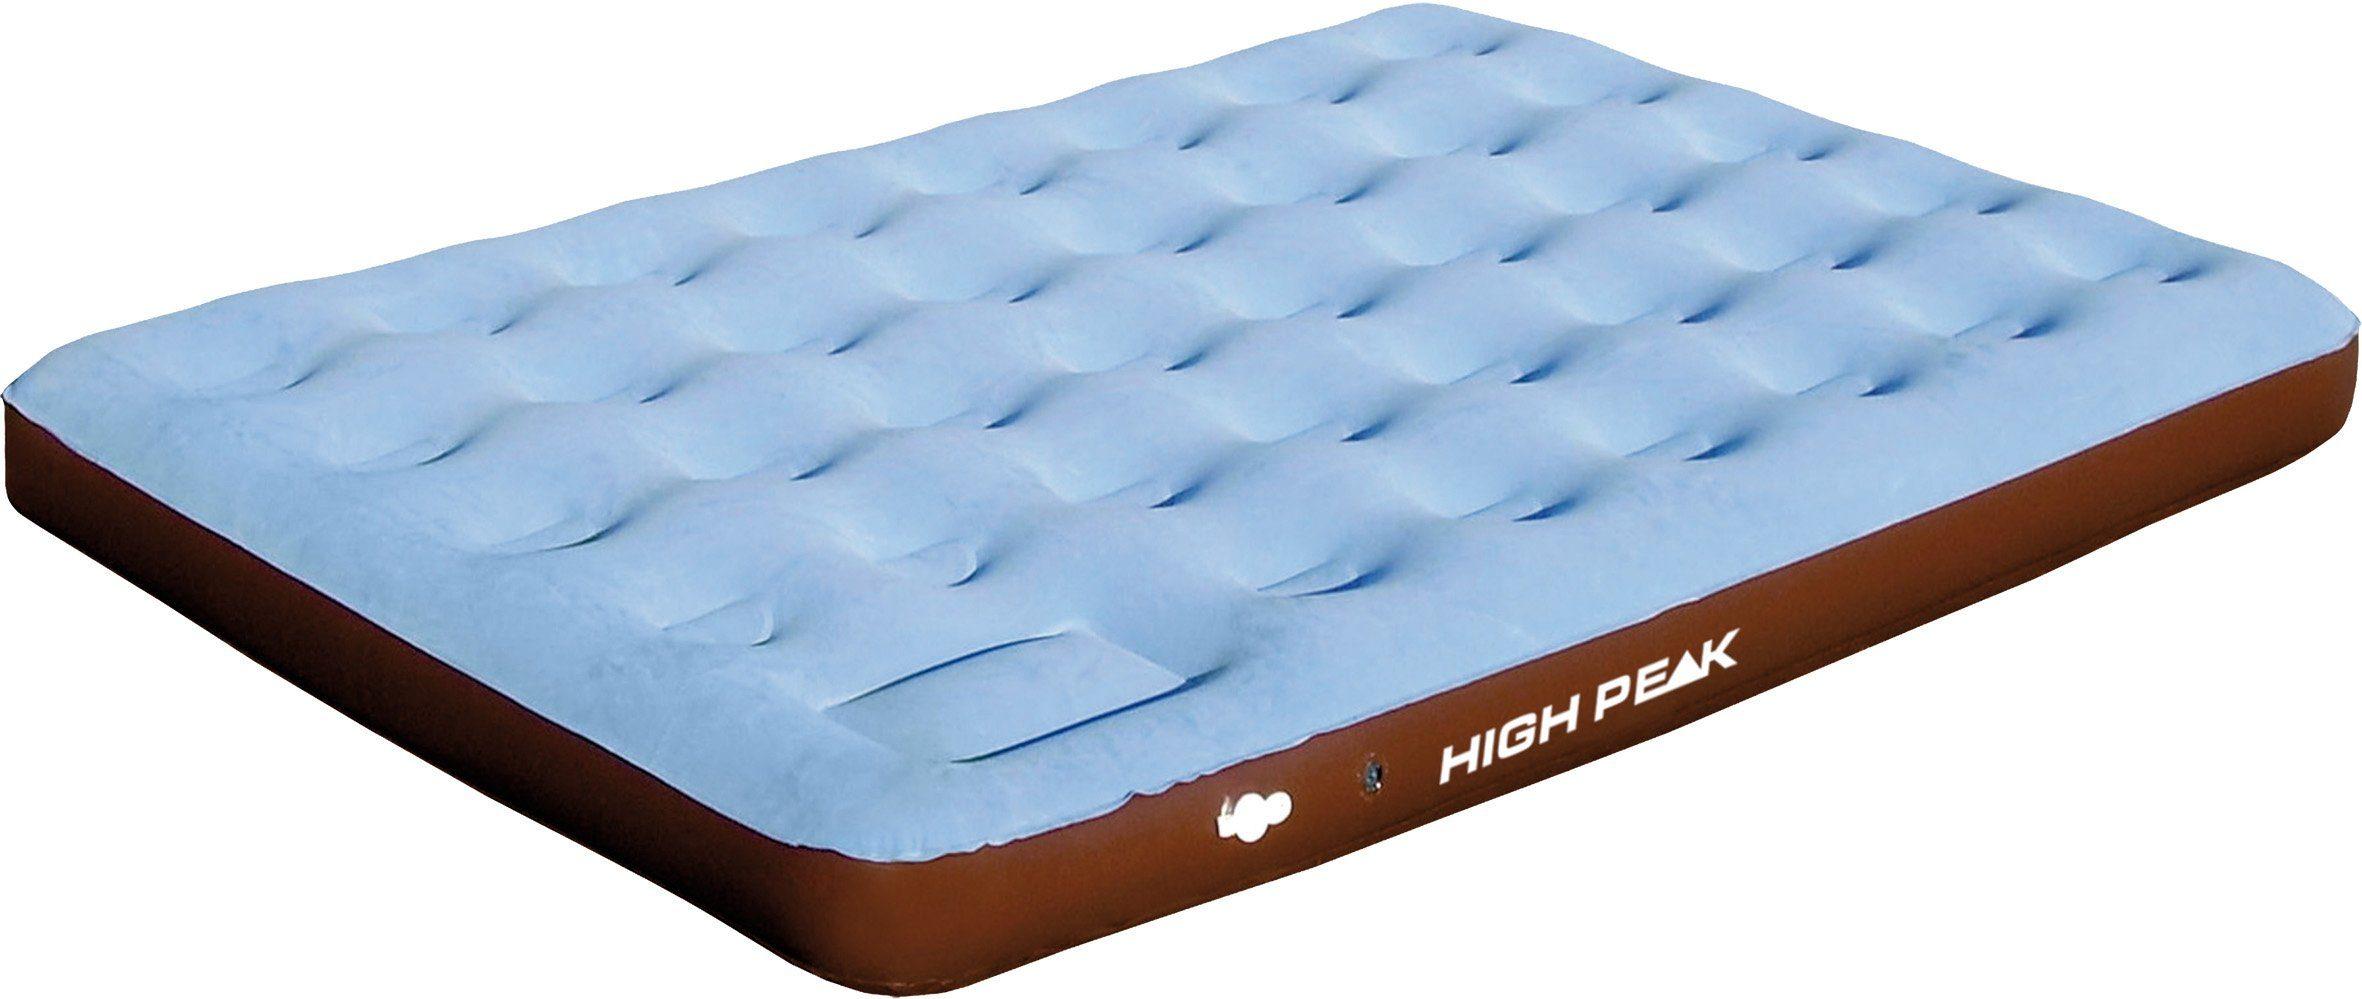 High Peak Luftbett, »Double Comfort Plus extra long«